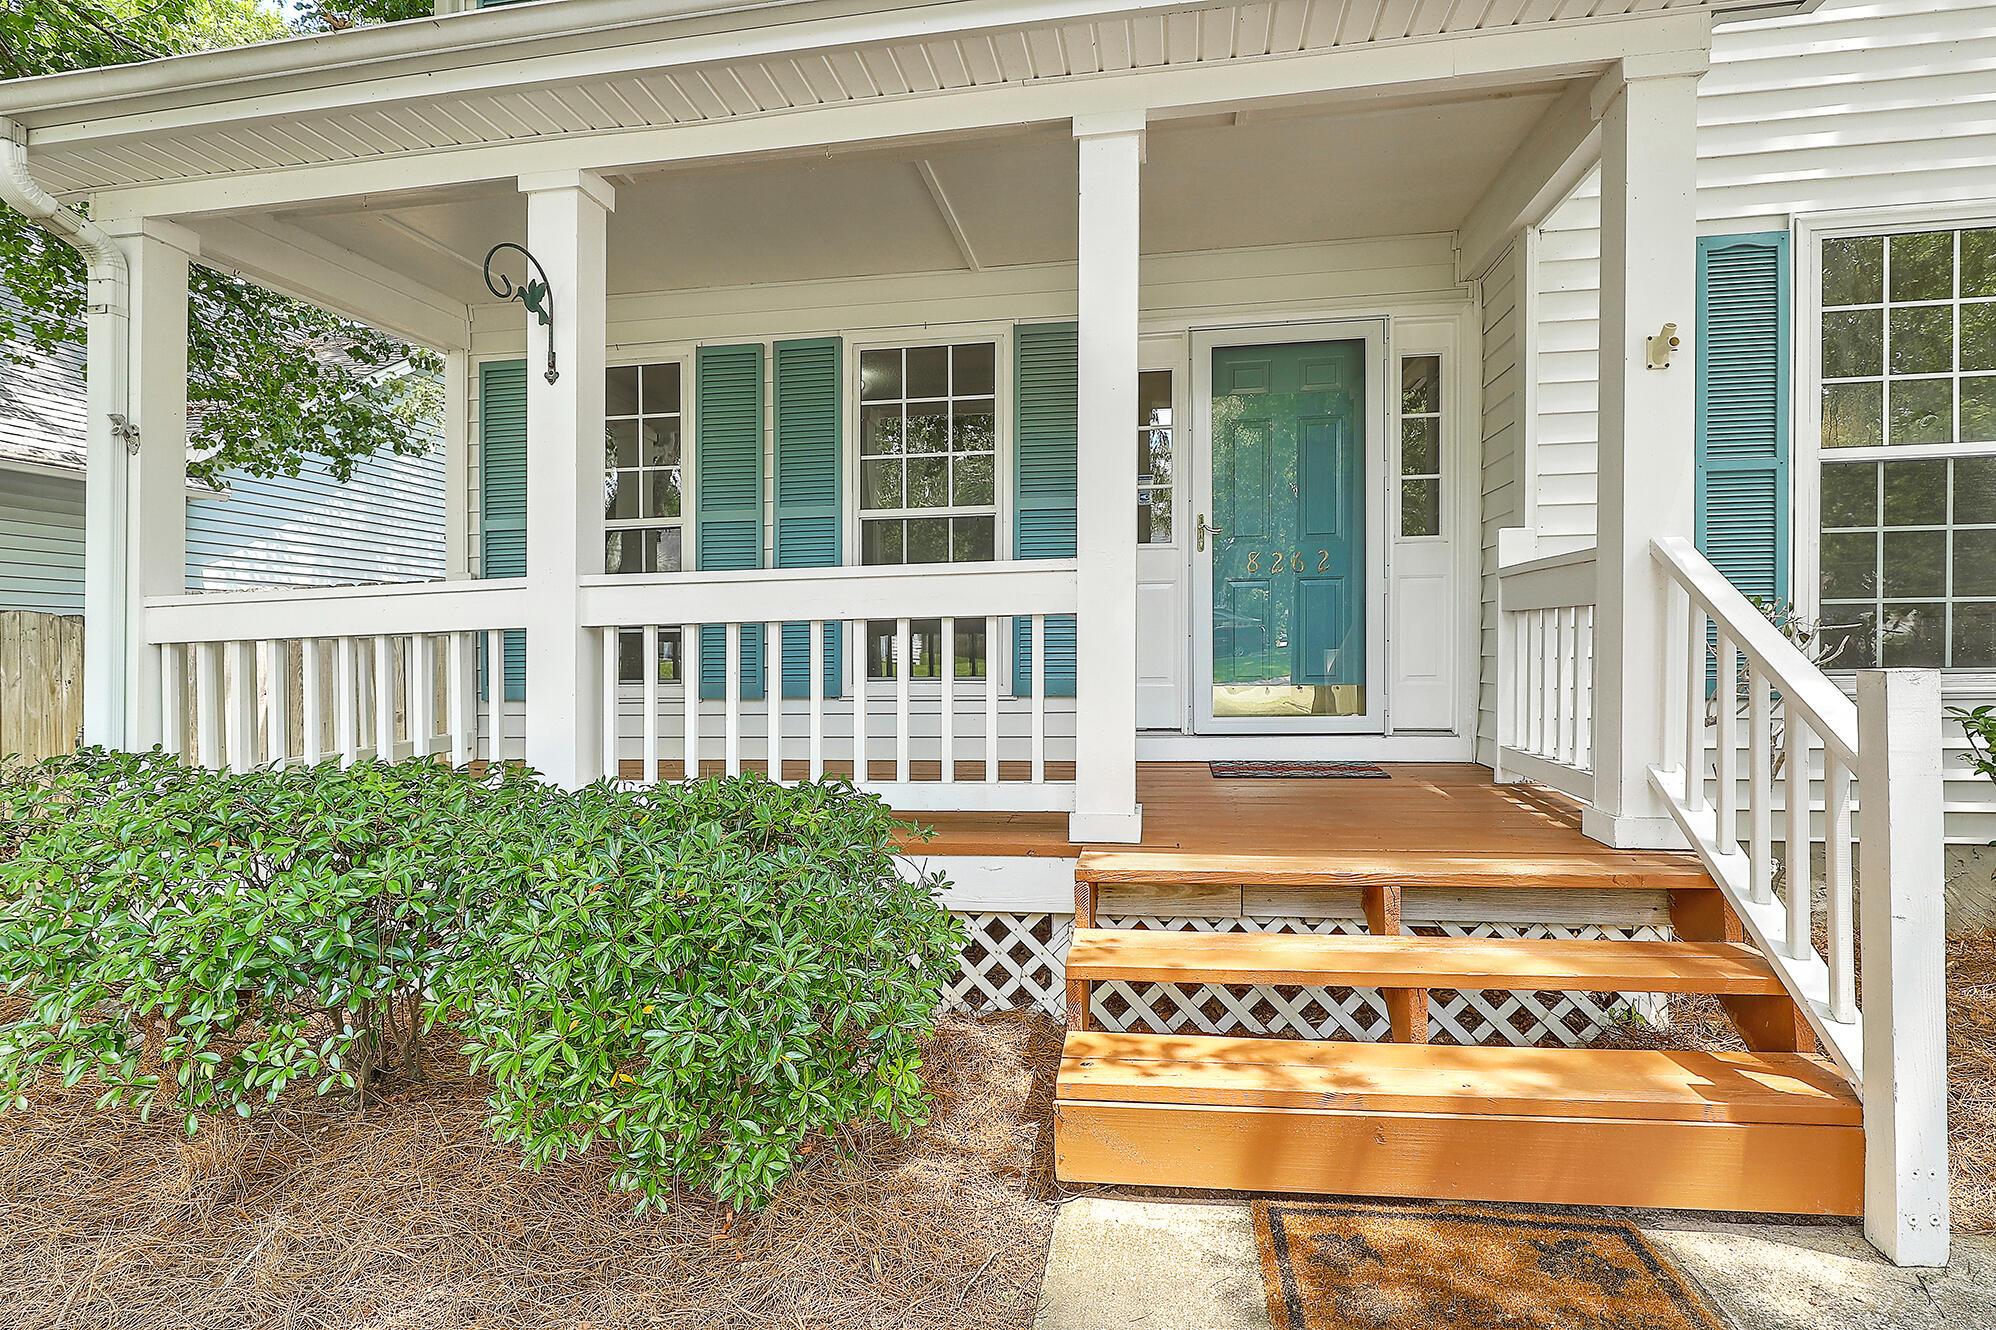 Appian Landing Homes For Sale - 8262 Longridge, North Charleston, SC - 26